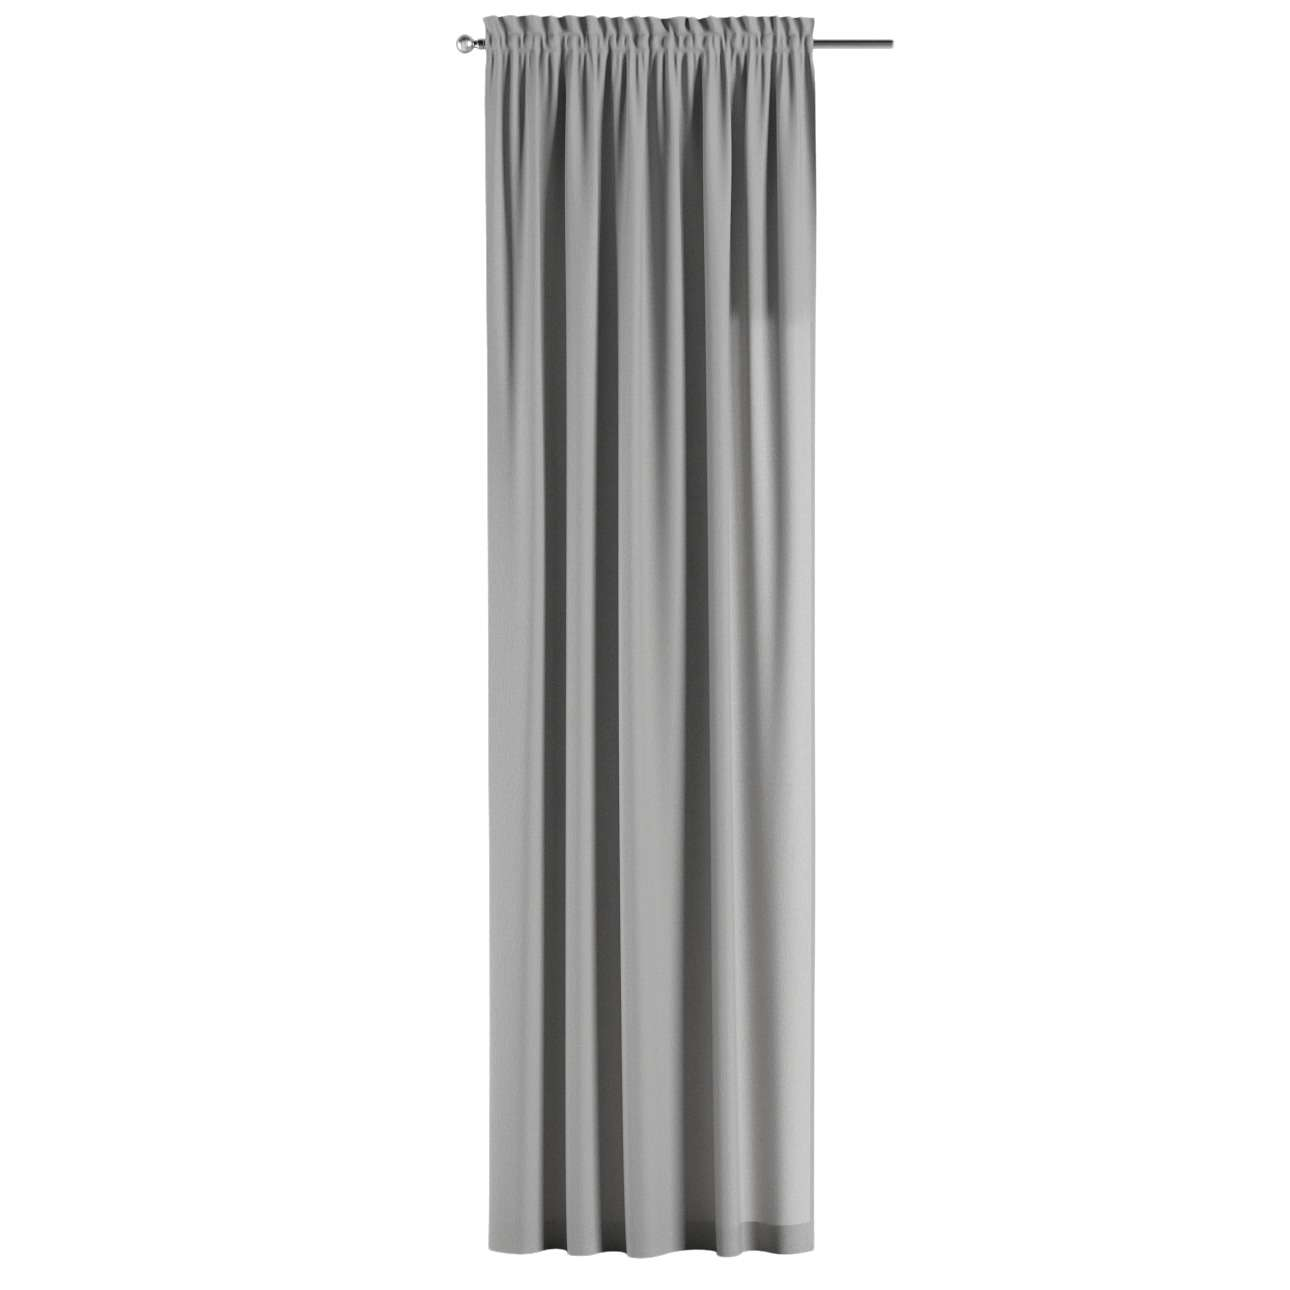 Gardin med løbegang - multibånd 1 stk. fra kollektionen Chenille, Stof: 702-23